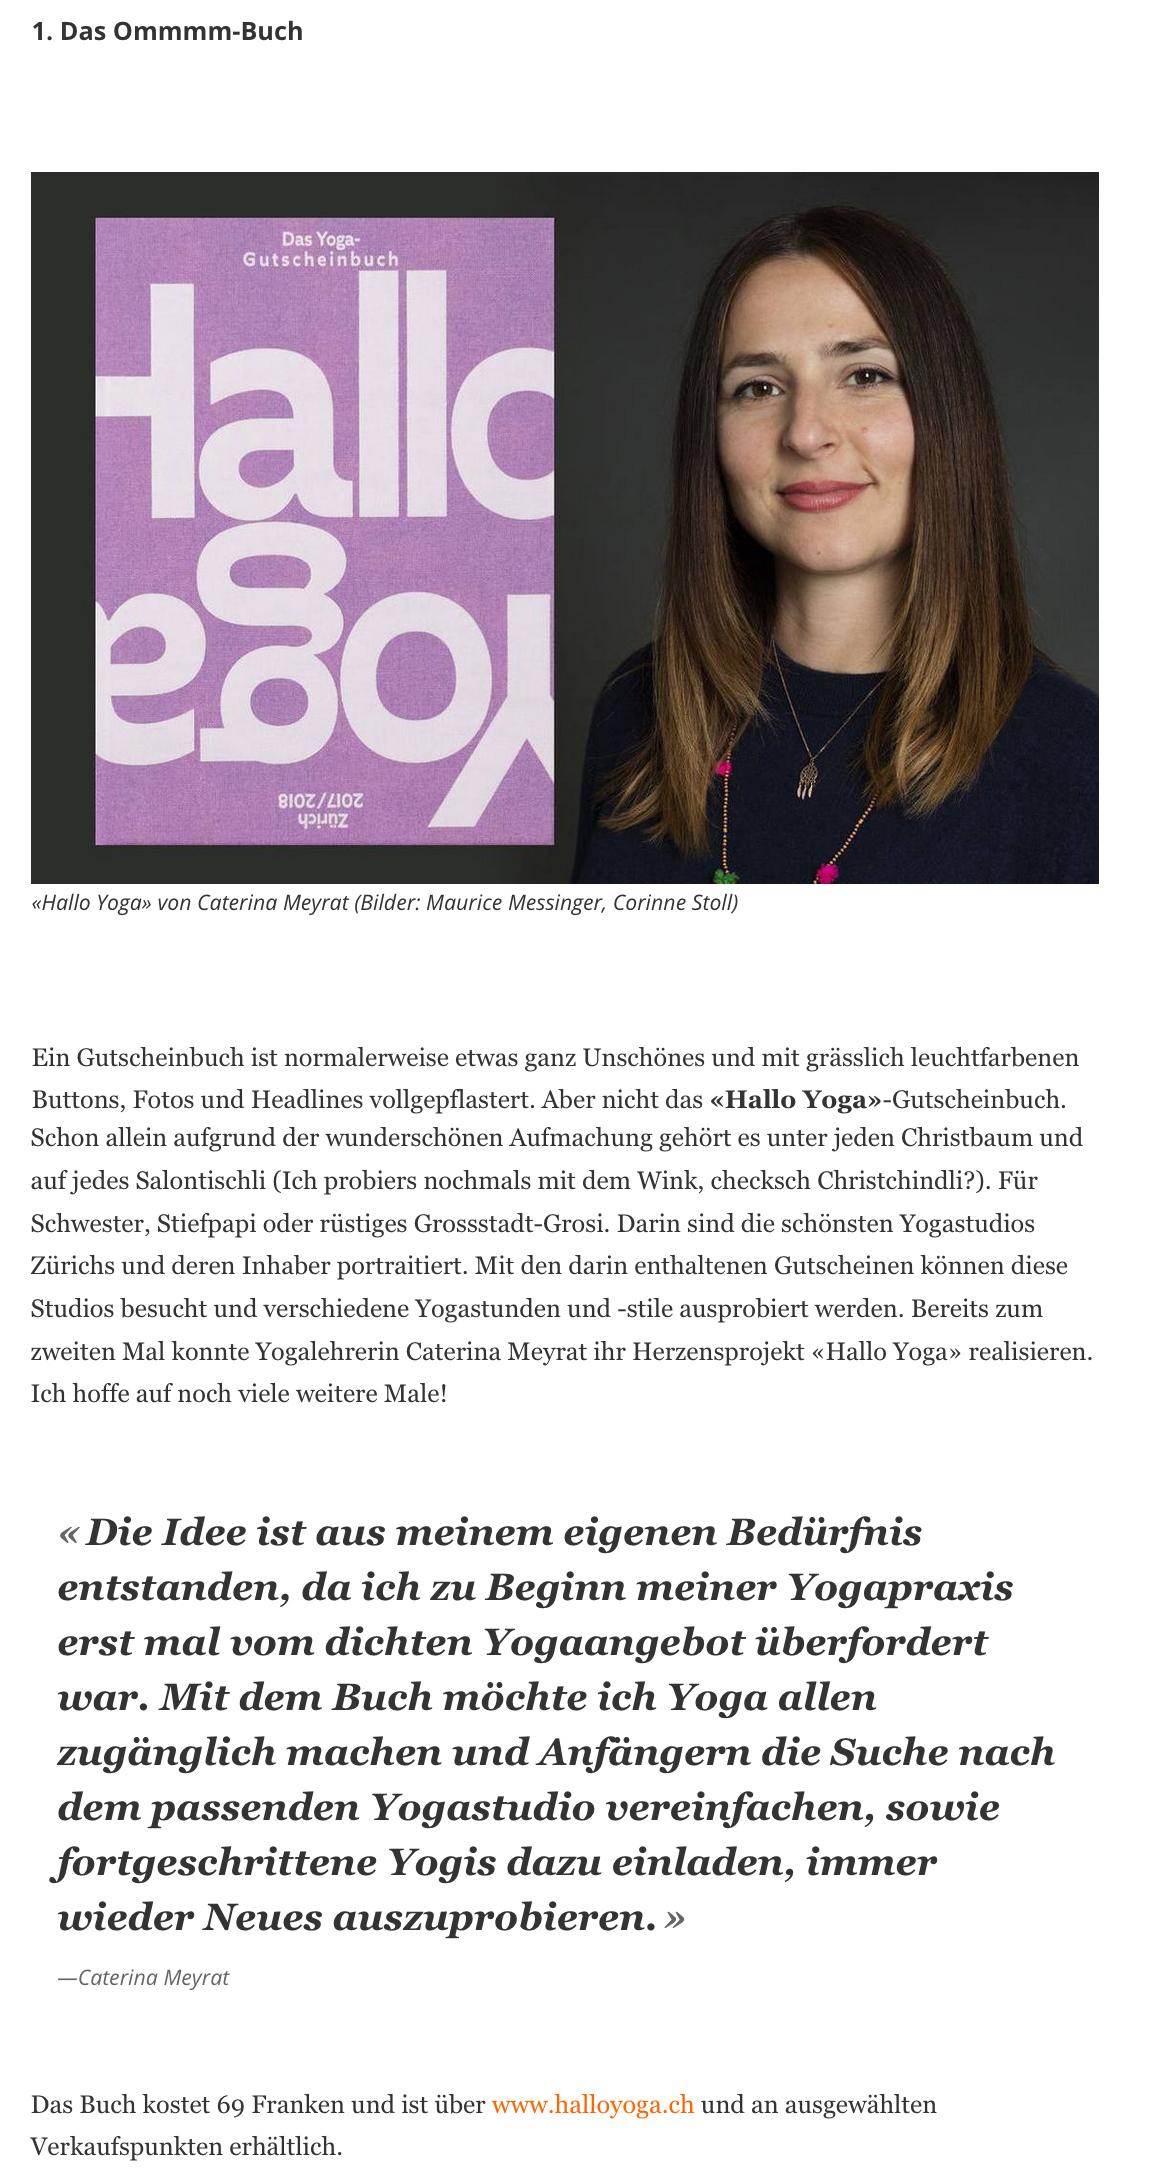 Migrosmagazin.ch, 30.11.2017